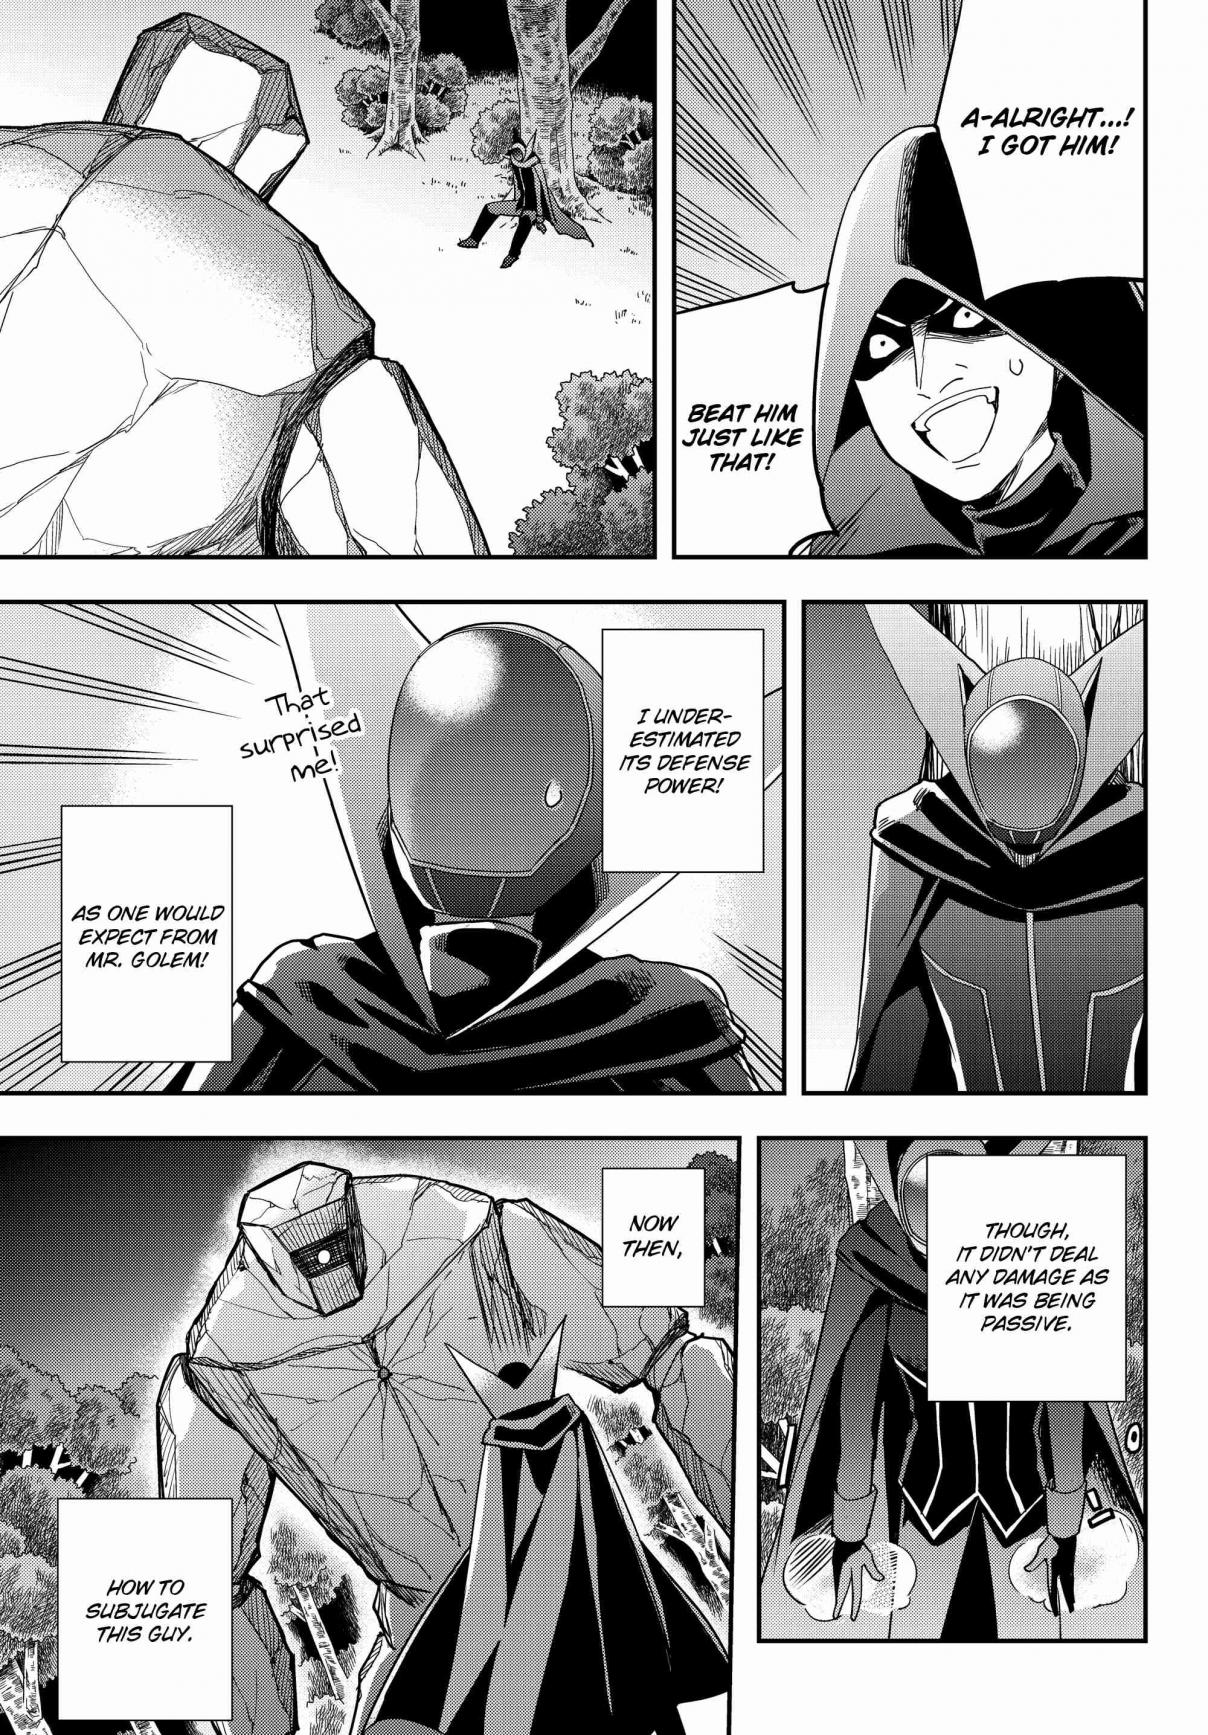 https://img2.nineanime.com/comics/pic2/14/26510/1254724/77a4df1abe7183c4302bce4fd120e216.jpg Page 1